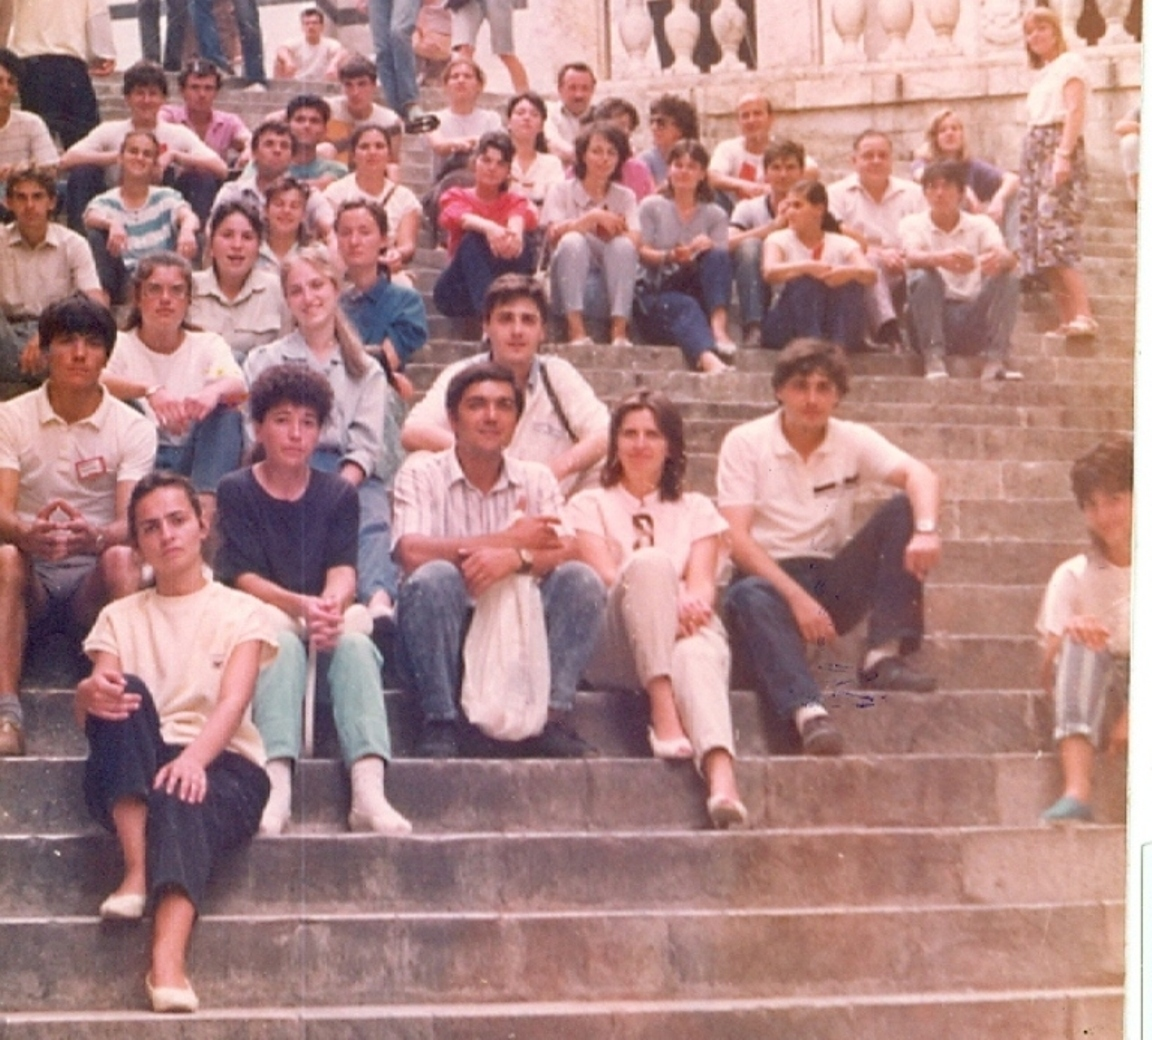 CORISTII BISERICII CRESTINE DUPA EVANGHELIE DRAGOS VODA LA PLIMBARE PRIN SIENA IN ITALIA - AUGUST 1990